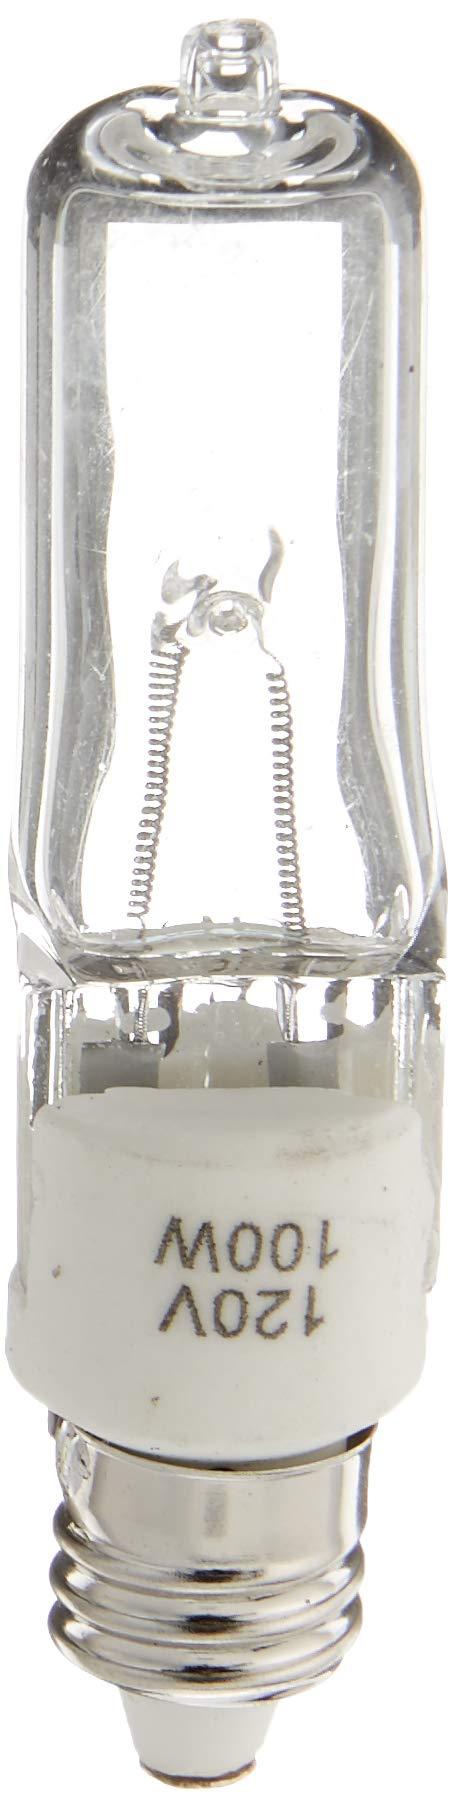 eTopLighting (10) Bulbs, 120V 100W Halogen Replacement Bulb, E11 Base, 120V 100W, Mini Candelabra